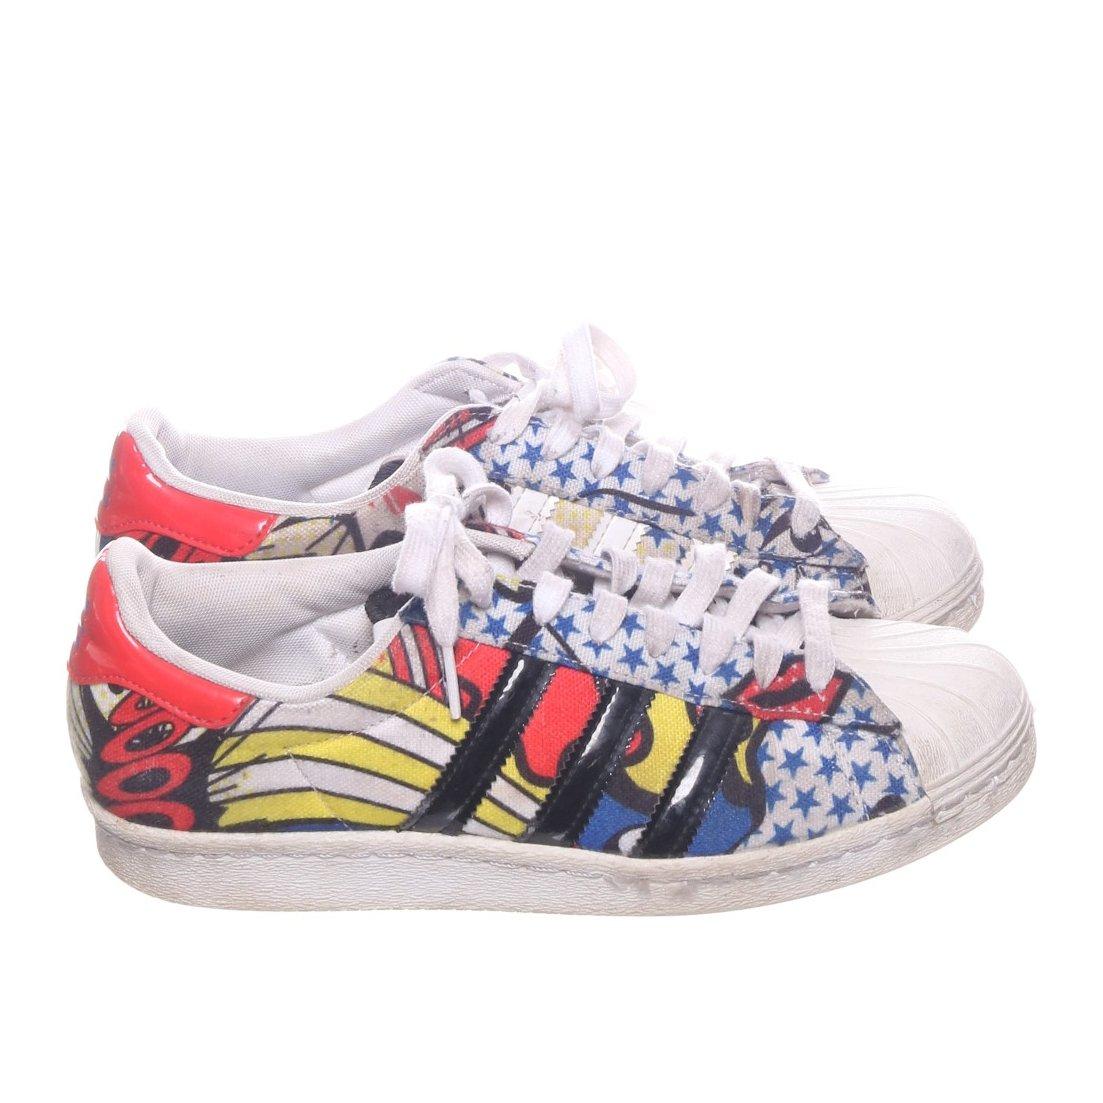 brand new cfd0c 4096b Adidas By Rita Ora, Sneakers, Strl  39, Original Superstar, Vit